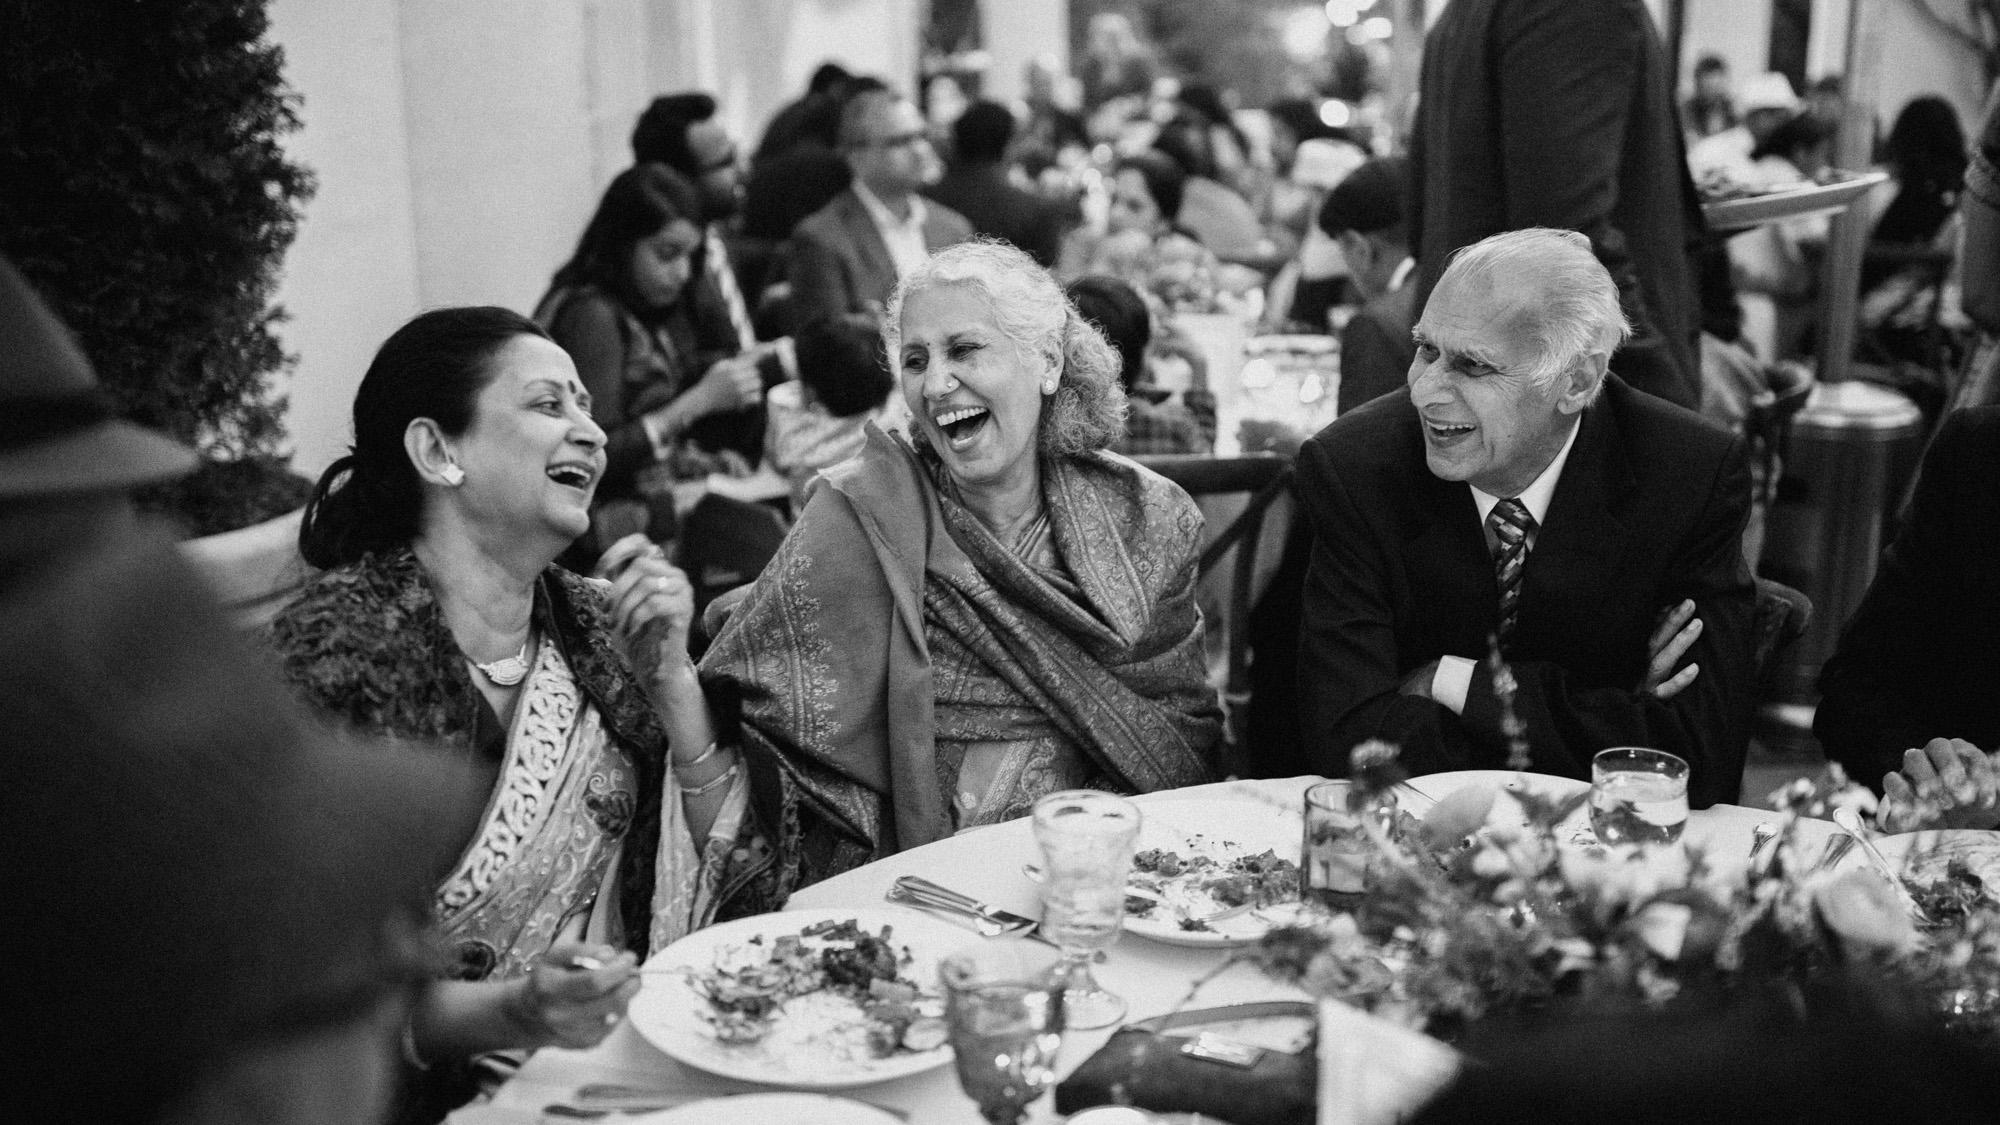 anu_maneesh_alec_vanderboom_Indian_wedding_photography-0165.jpg